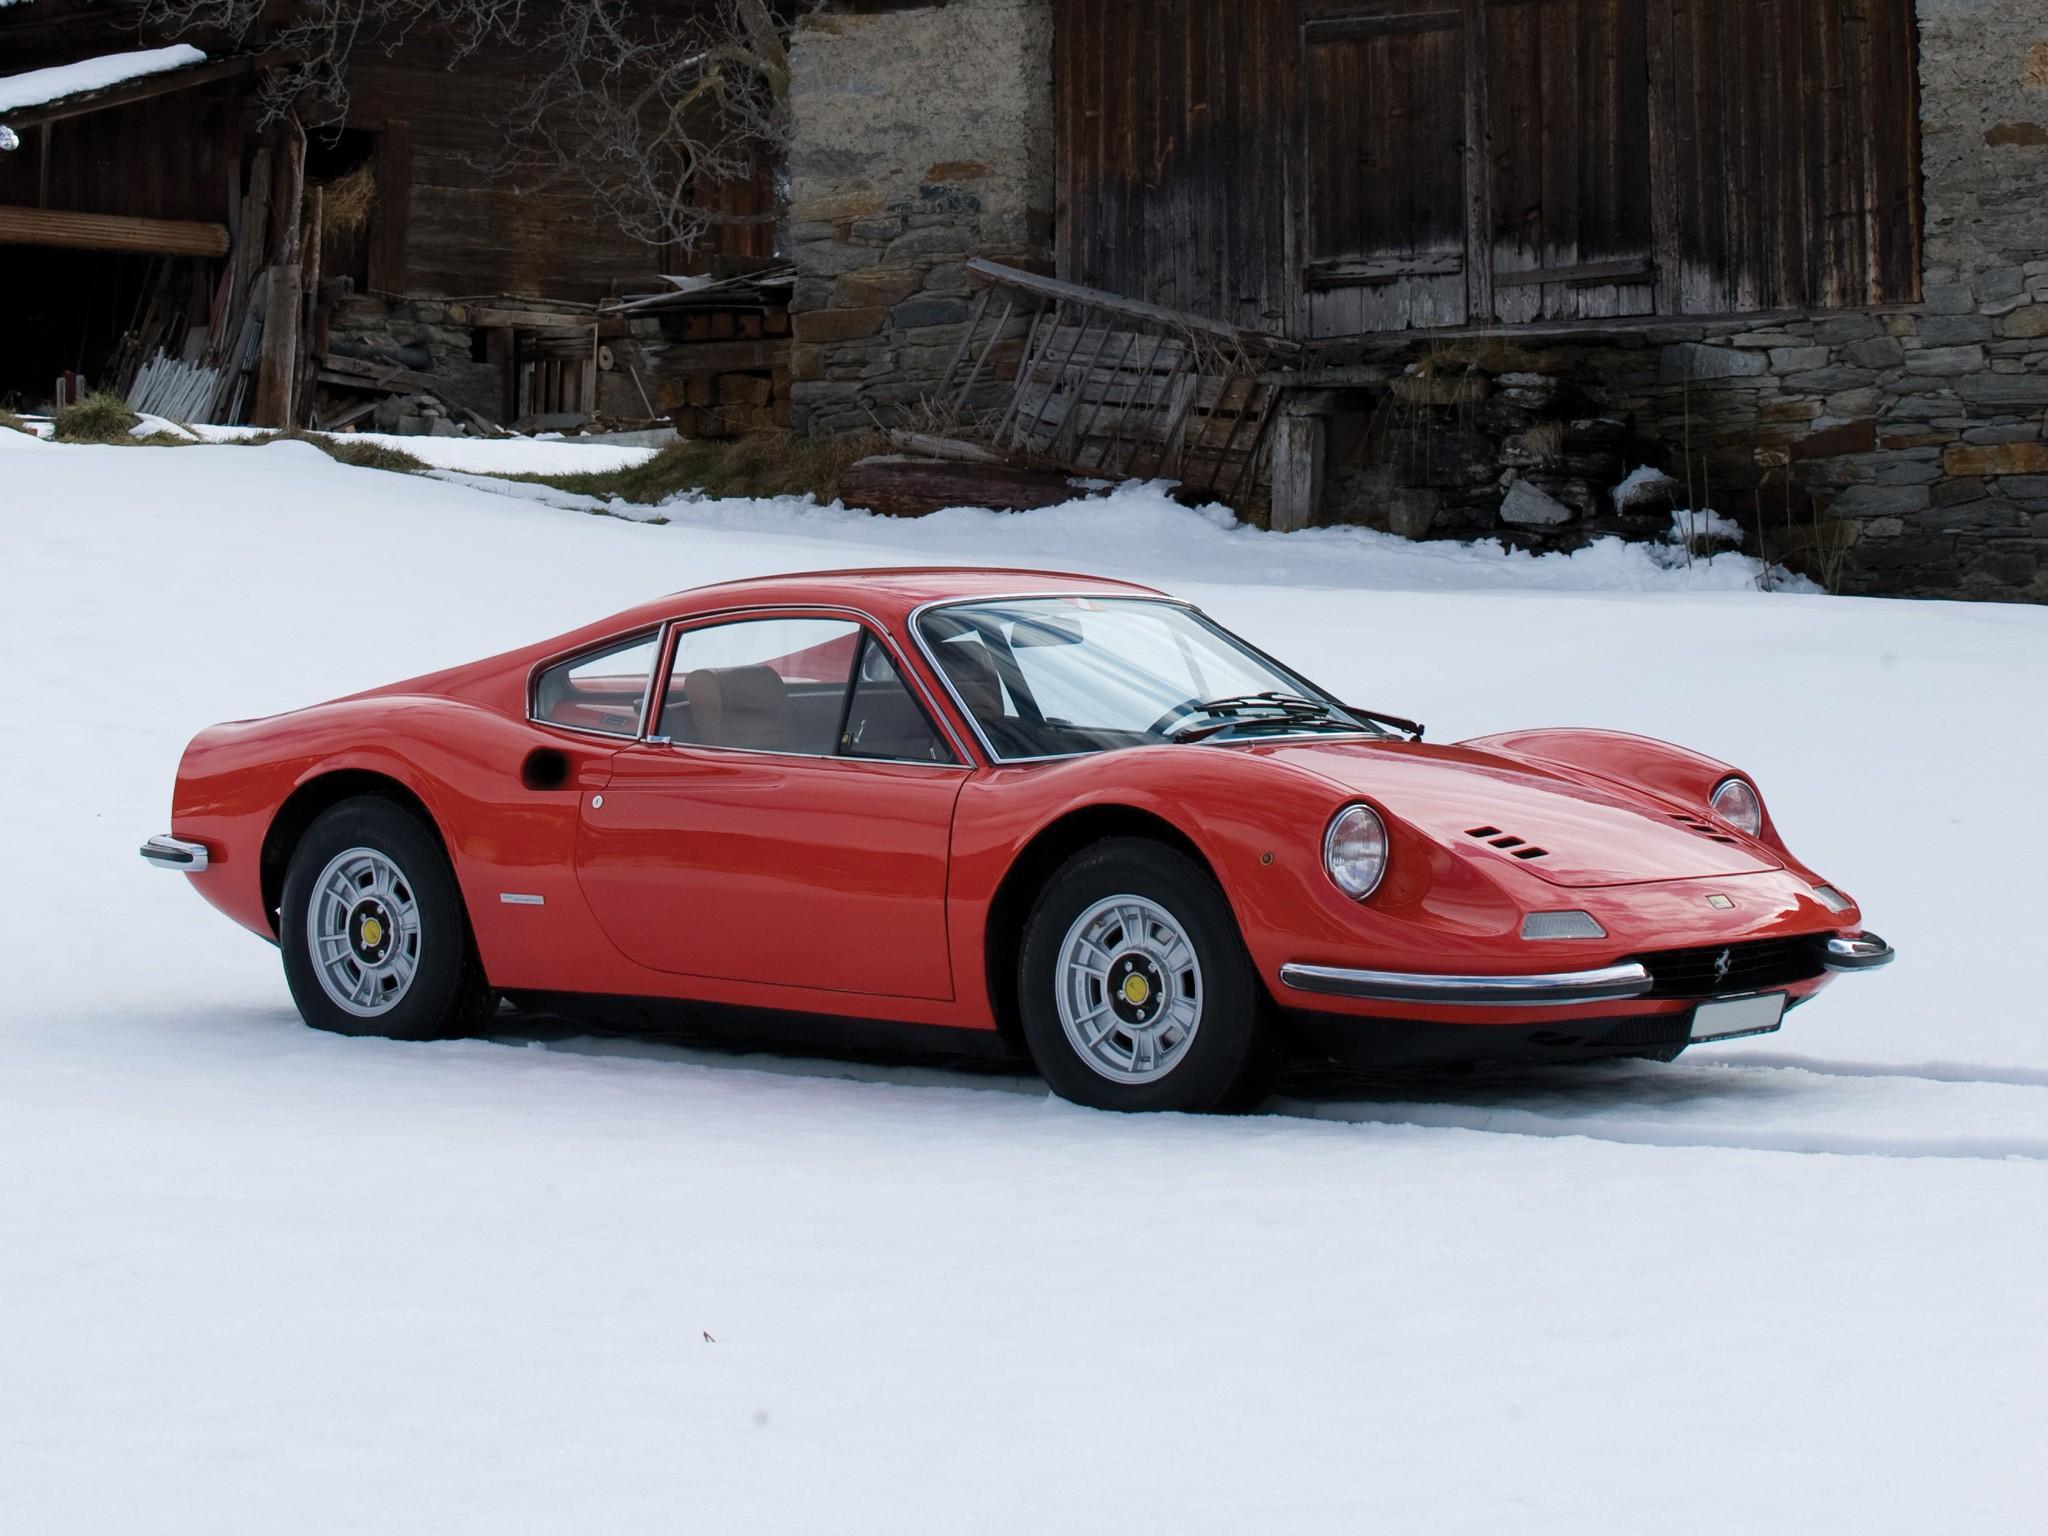 Ferrari Dino 246 Gt 1969 1970 1971 1972 1973 1974 Autoevolution